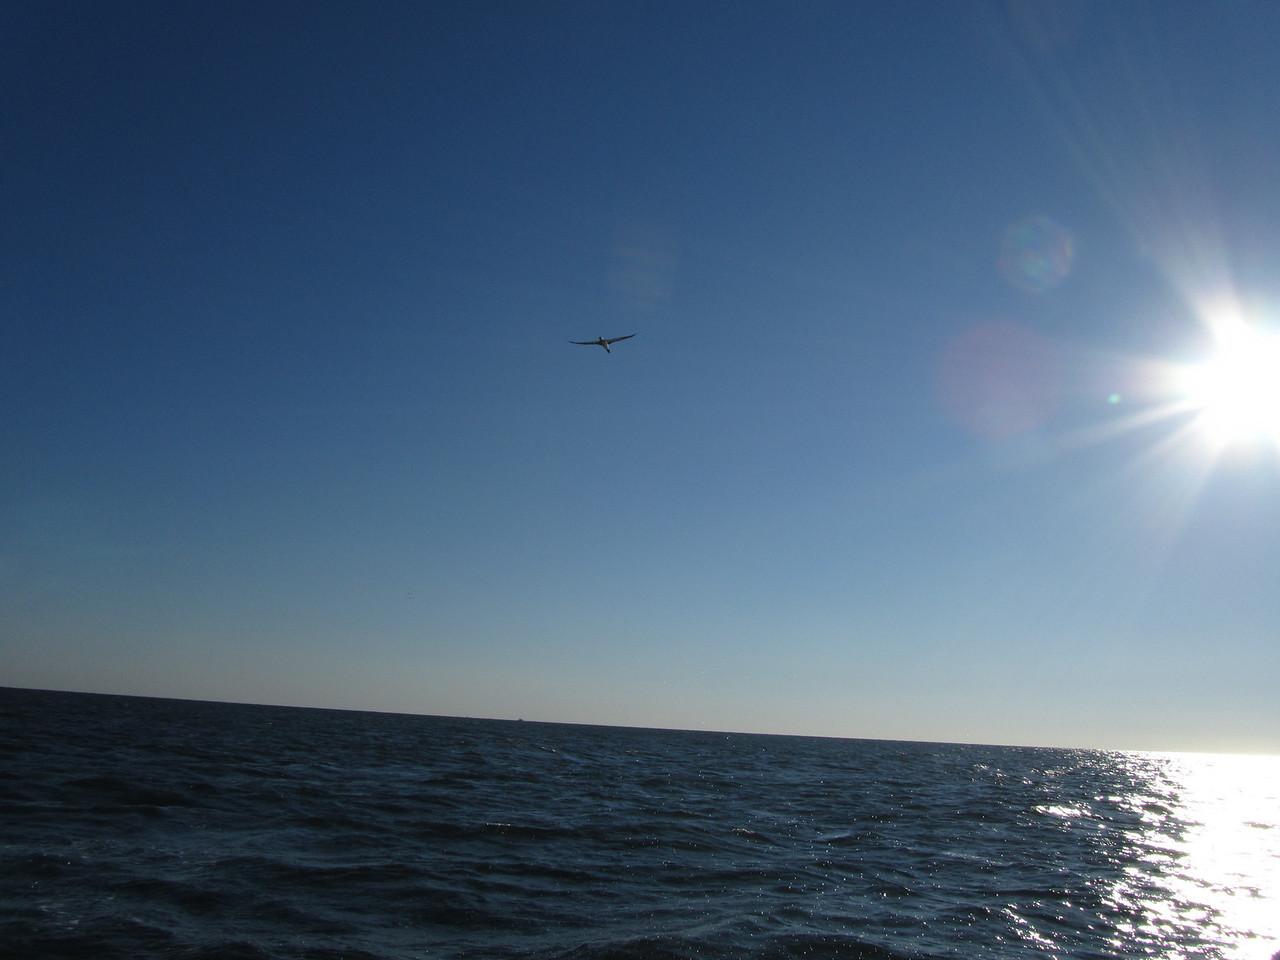 Big old bird hunting for sardines.